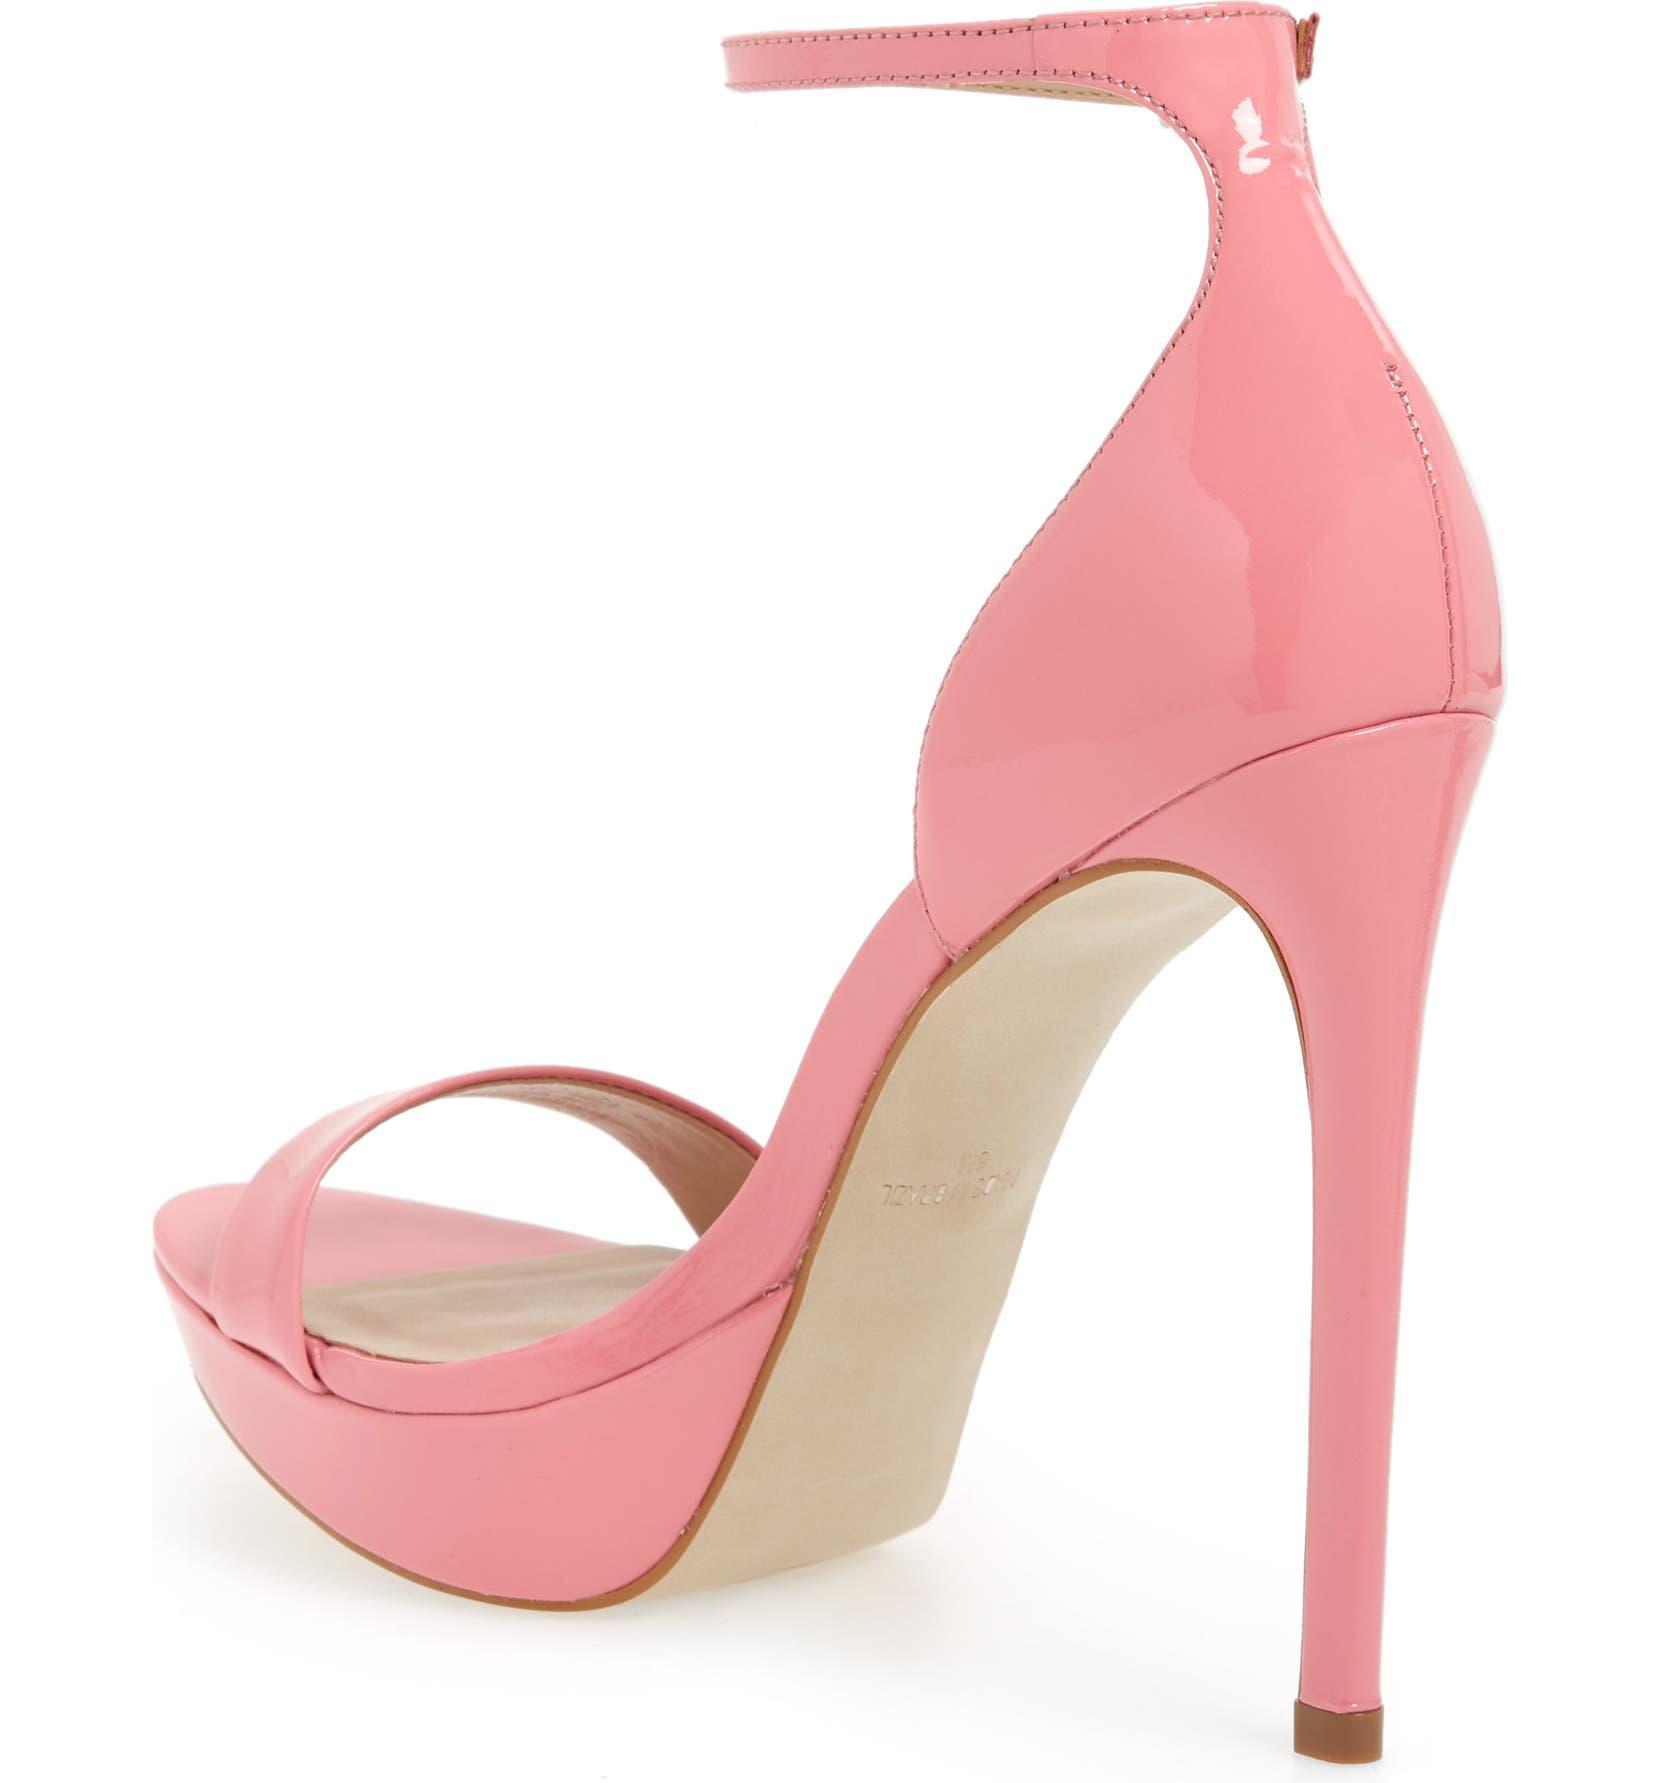 acb2a23ac82 Steve Madden Starlet Platform Sandal (Women)